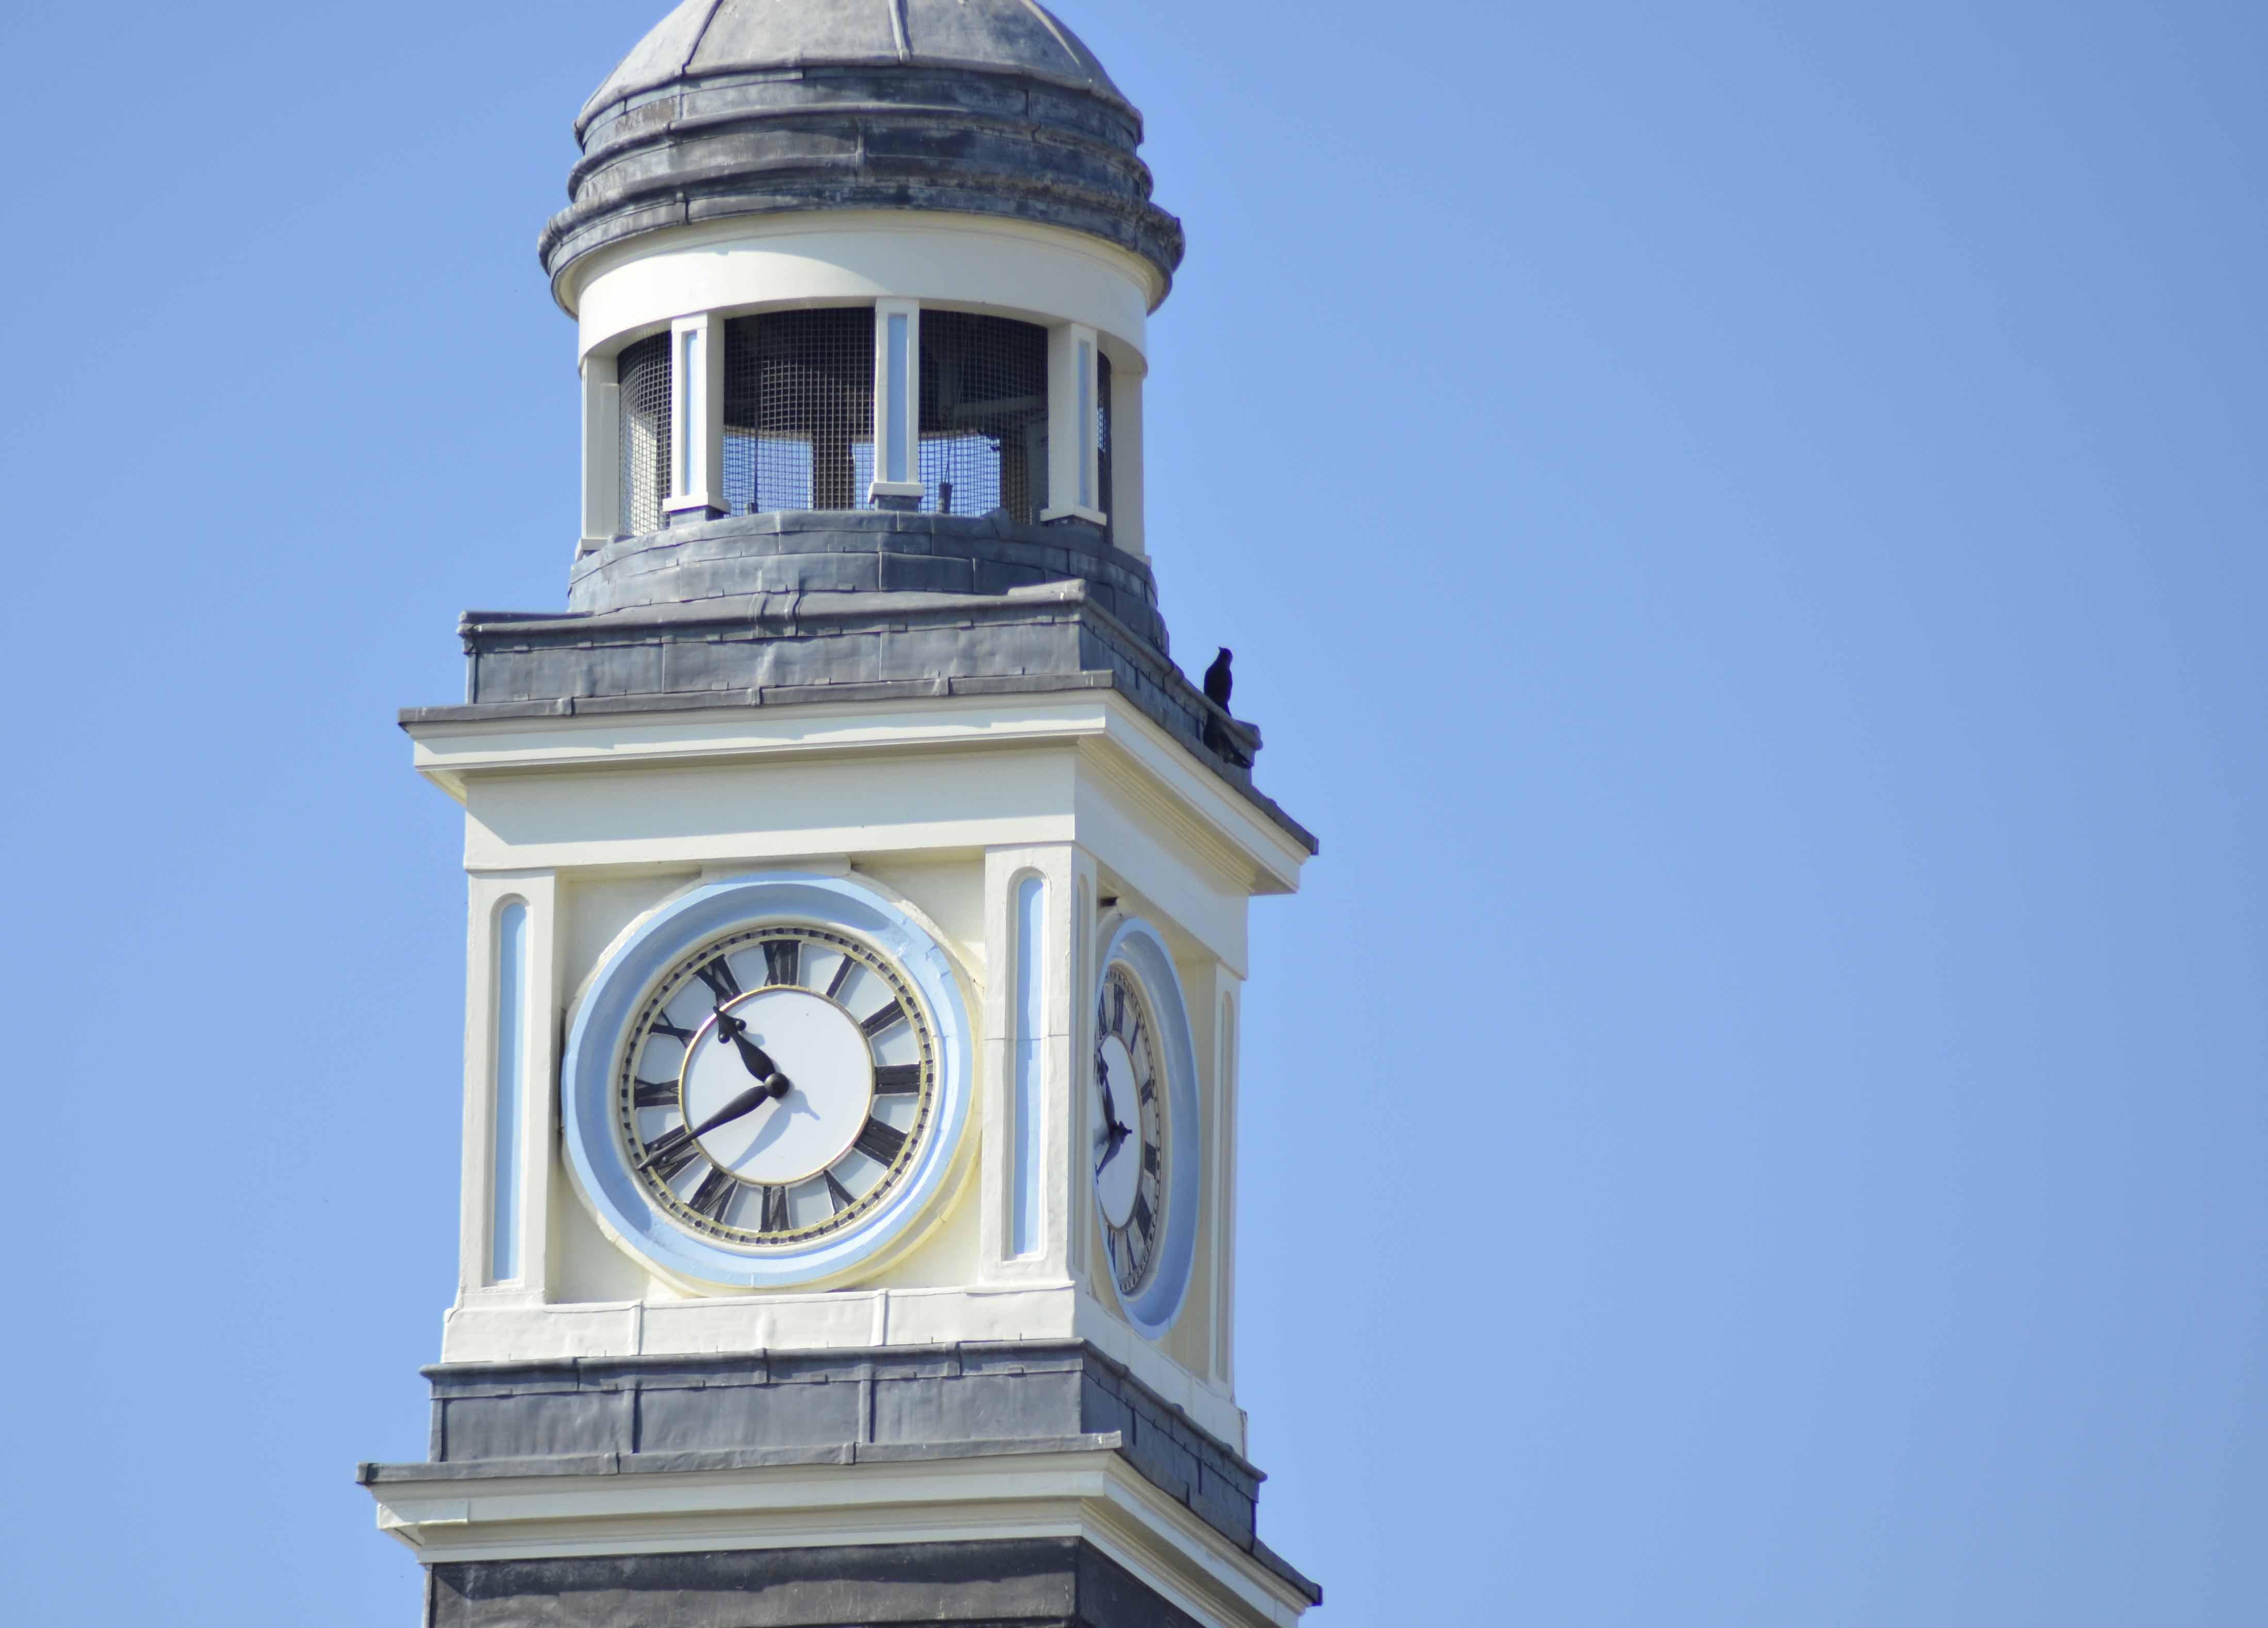 Chard Guildhall clock